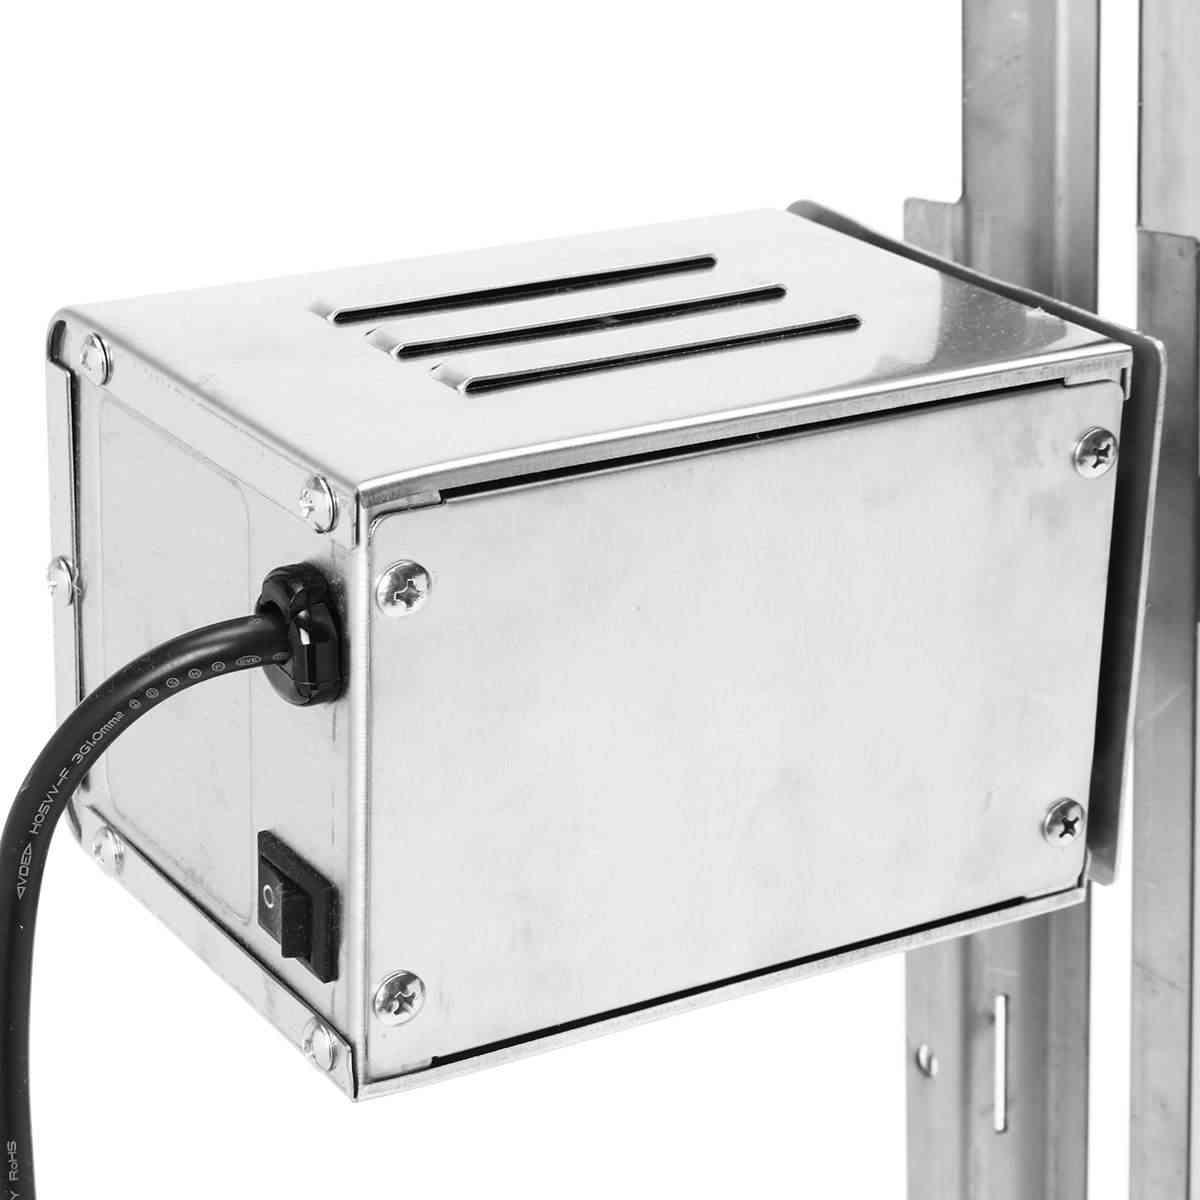 15 W AU Berkemah Di Luar Ruangan Listrik Otomatis BBQ Grill Panggangan Motor Panggang Cabang Logam Meludah Roaster Batang Arang Ayam Babi